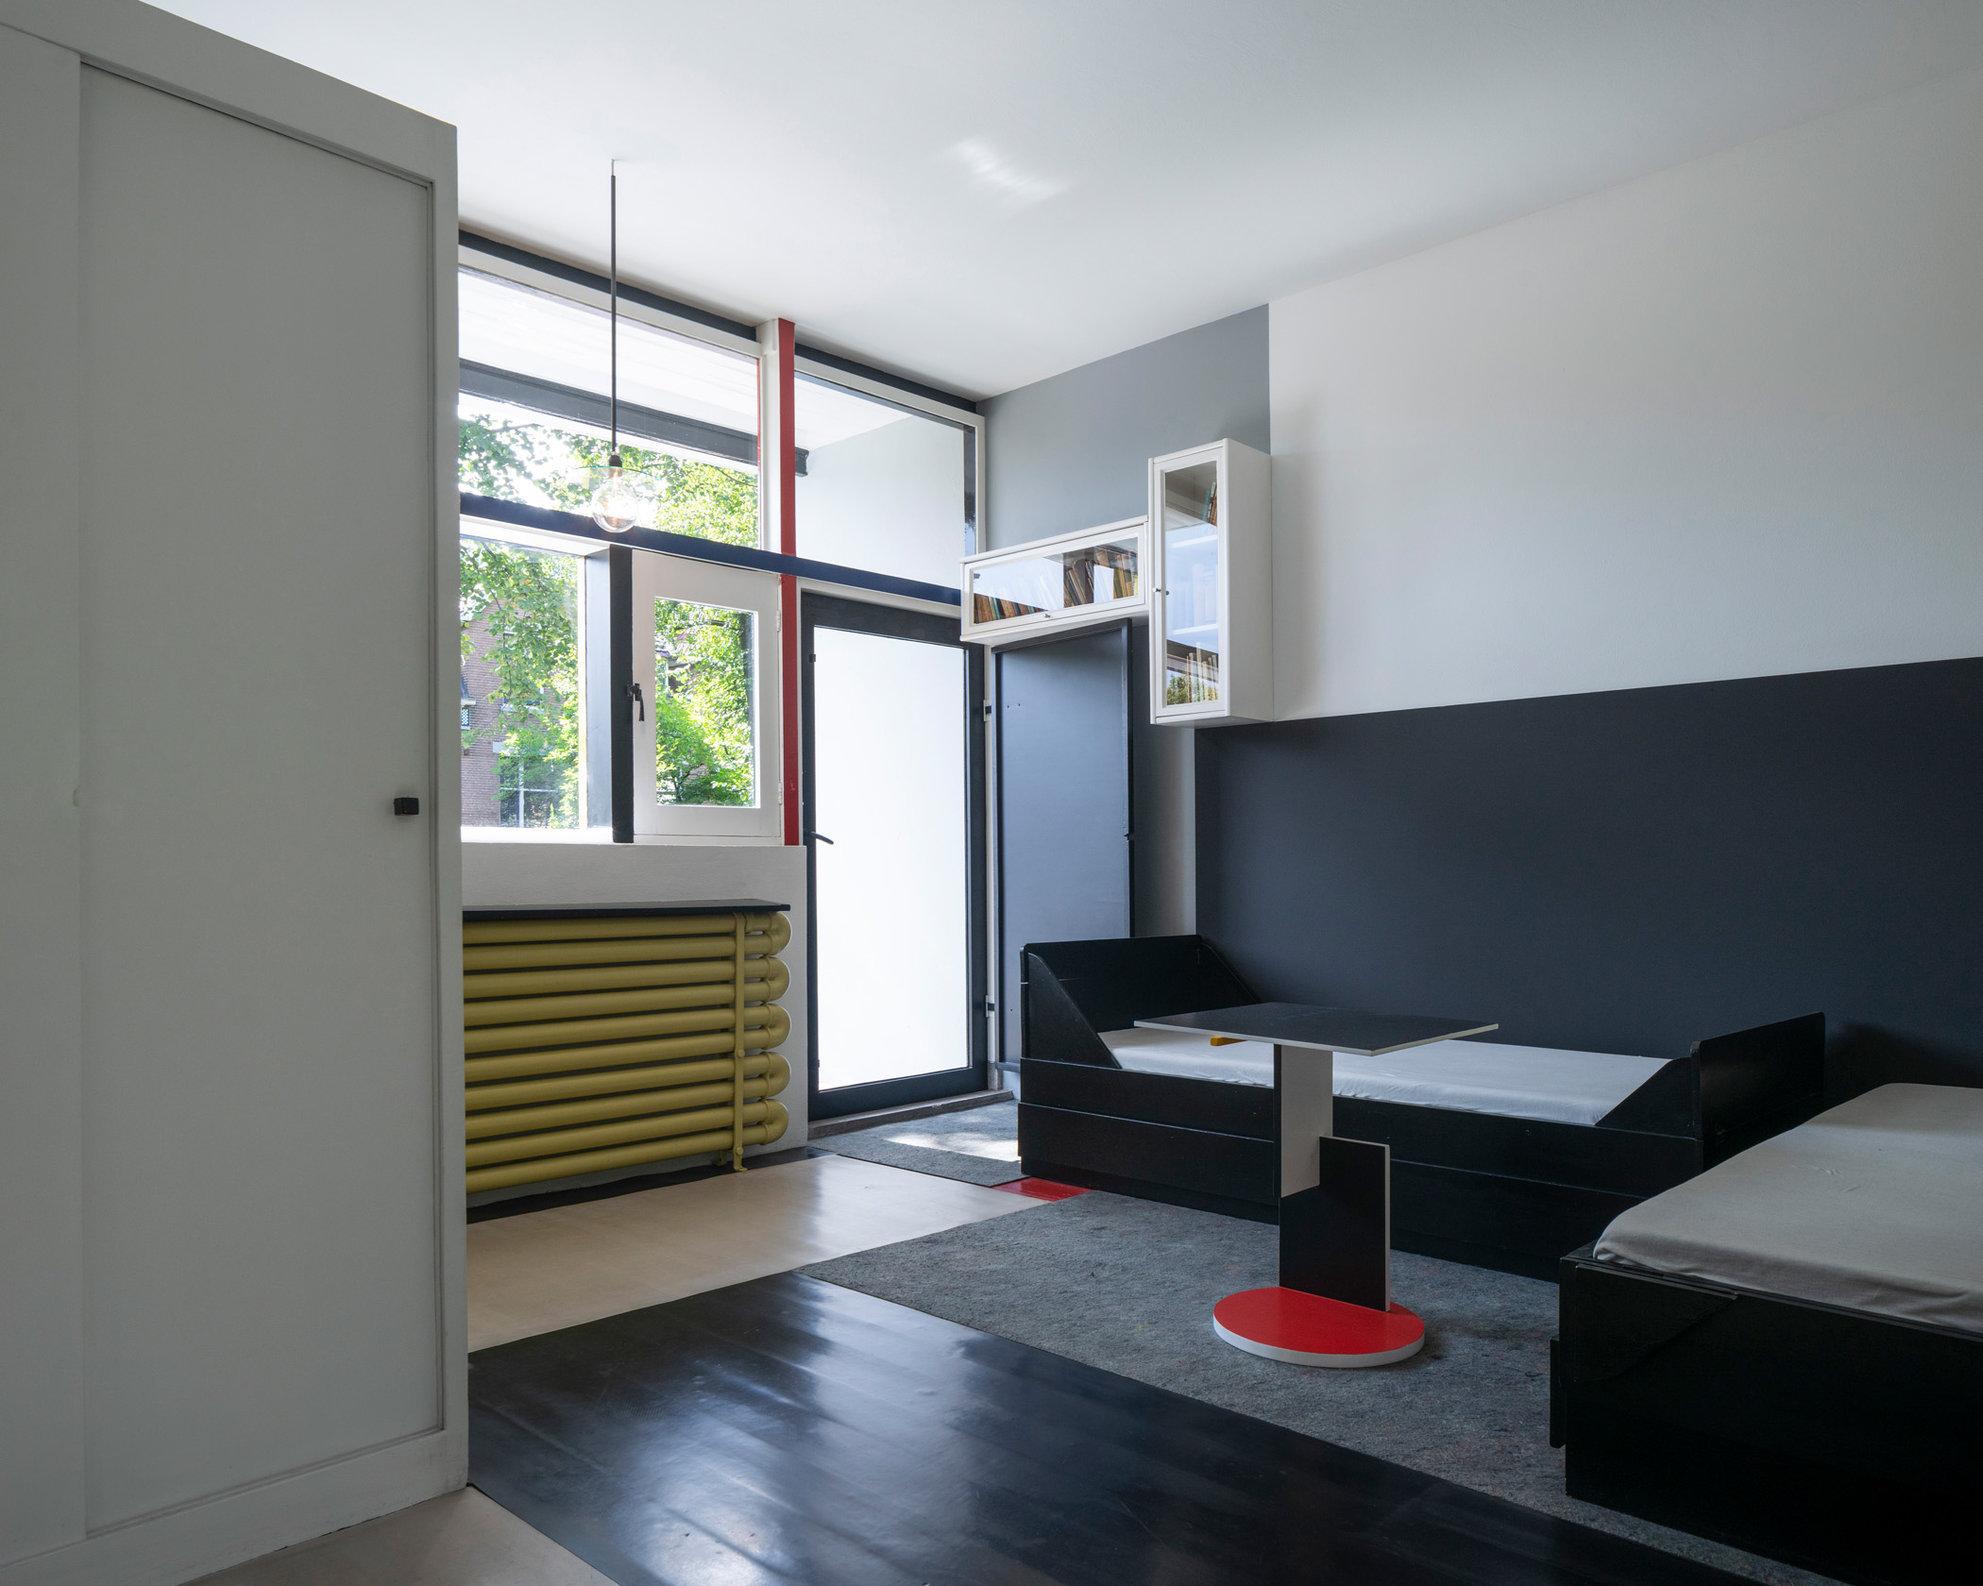 Schröder House - Gerrit Rietveld